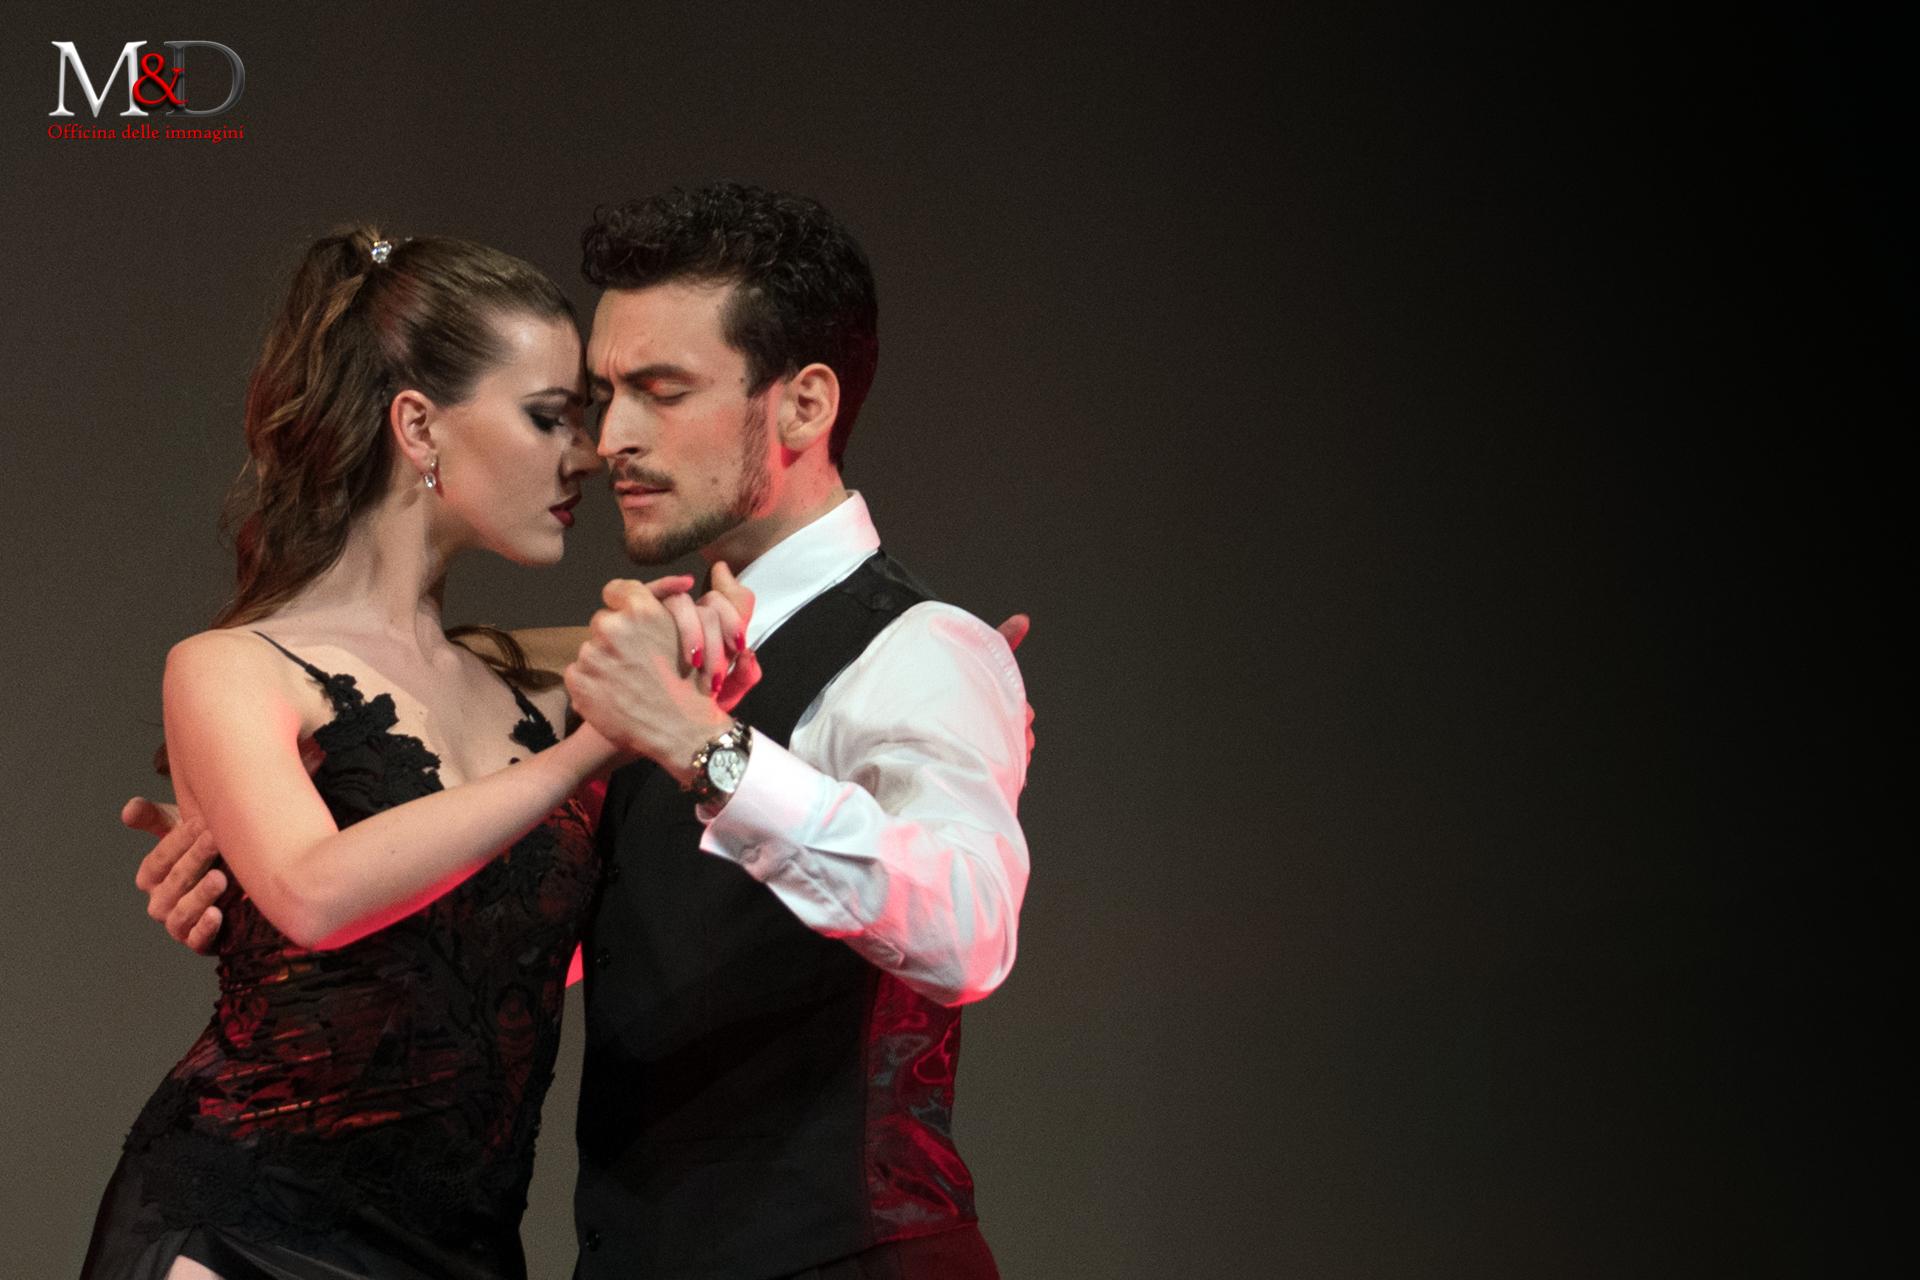 Andrea Vighi y Chiara Benati